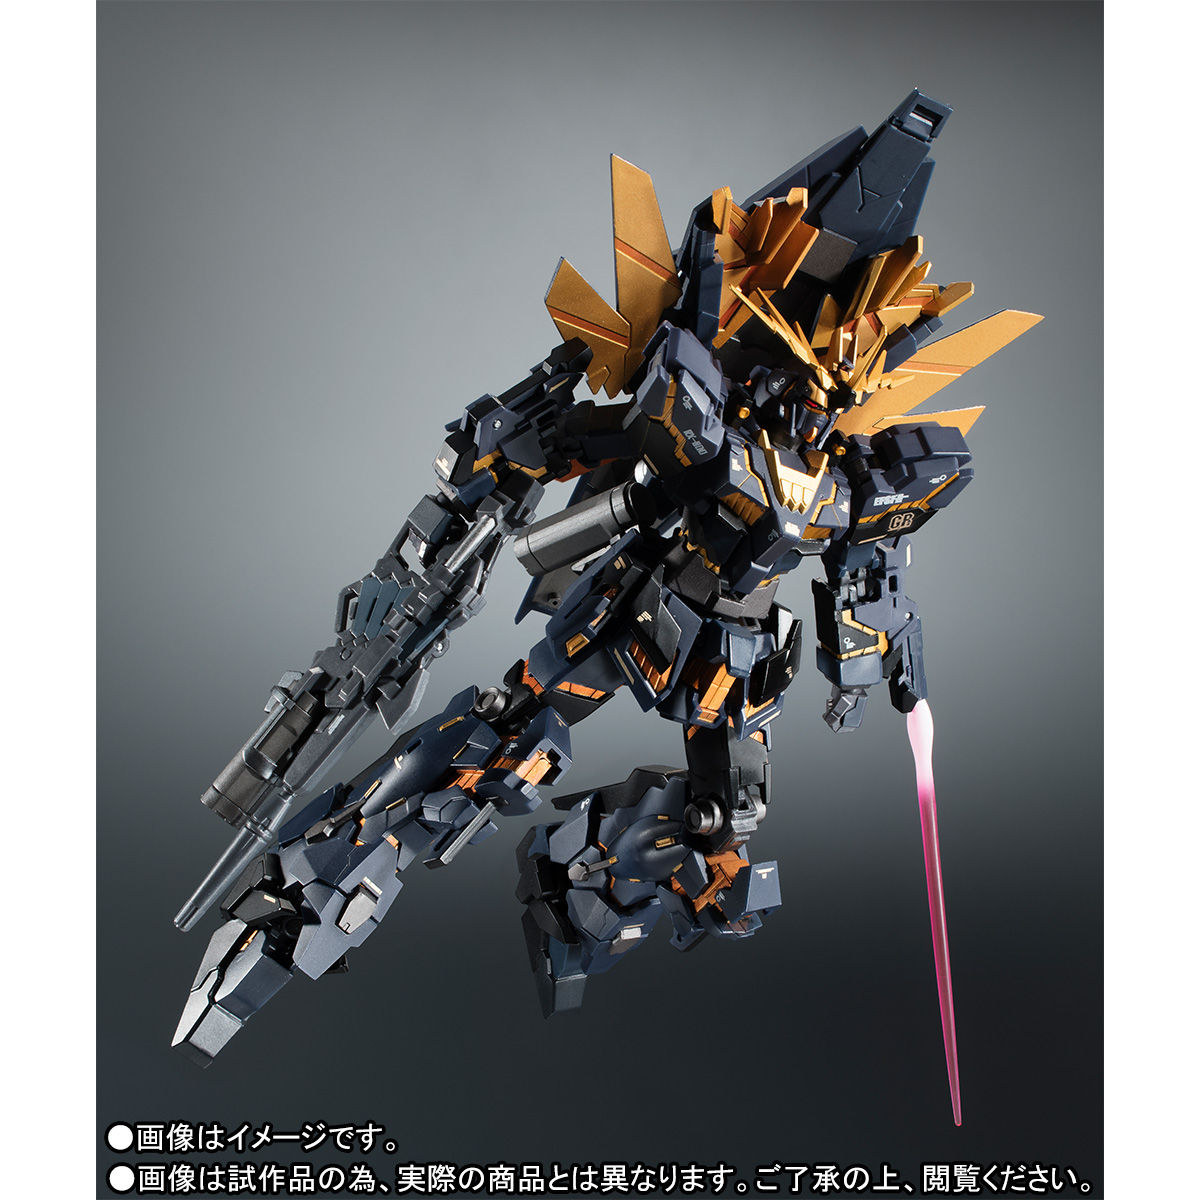 ROBOT魂〈SIDE MS〉『バンシィ・ノルン SPパック リアルマーキングVer.』可動フィギュア-008